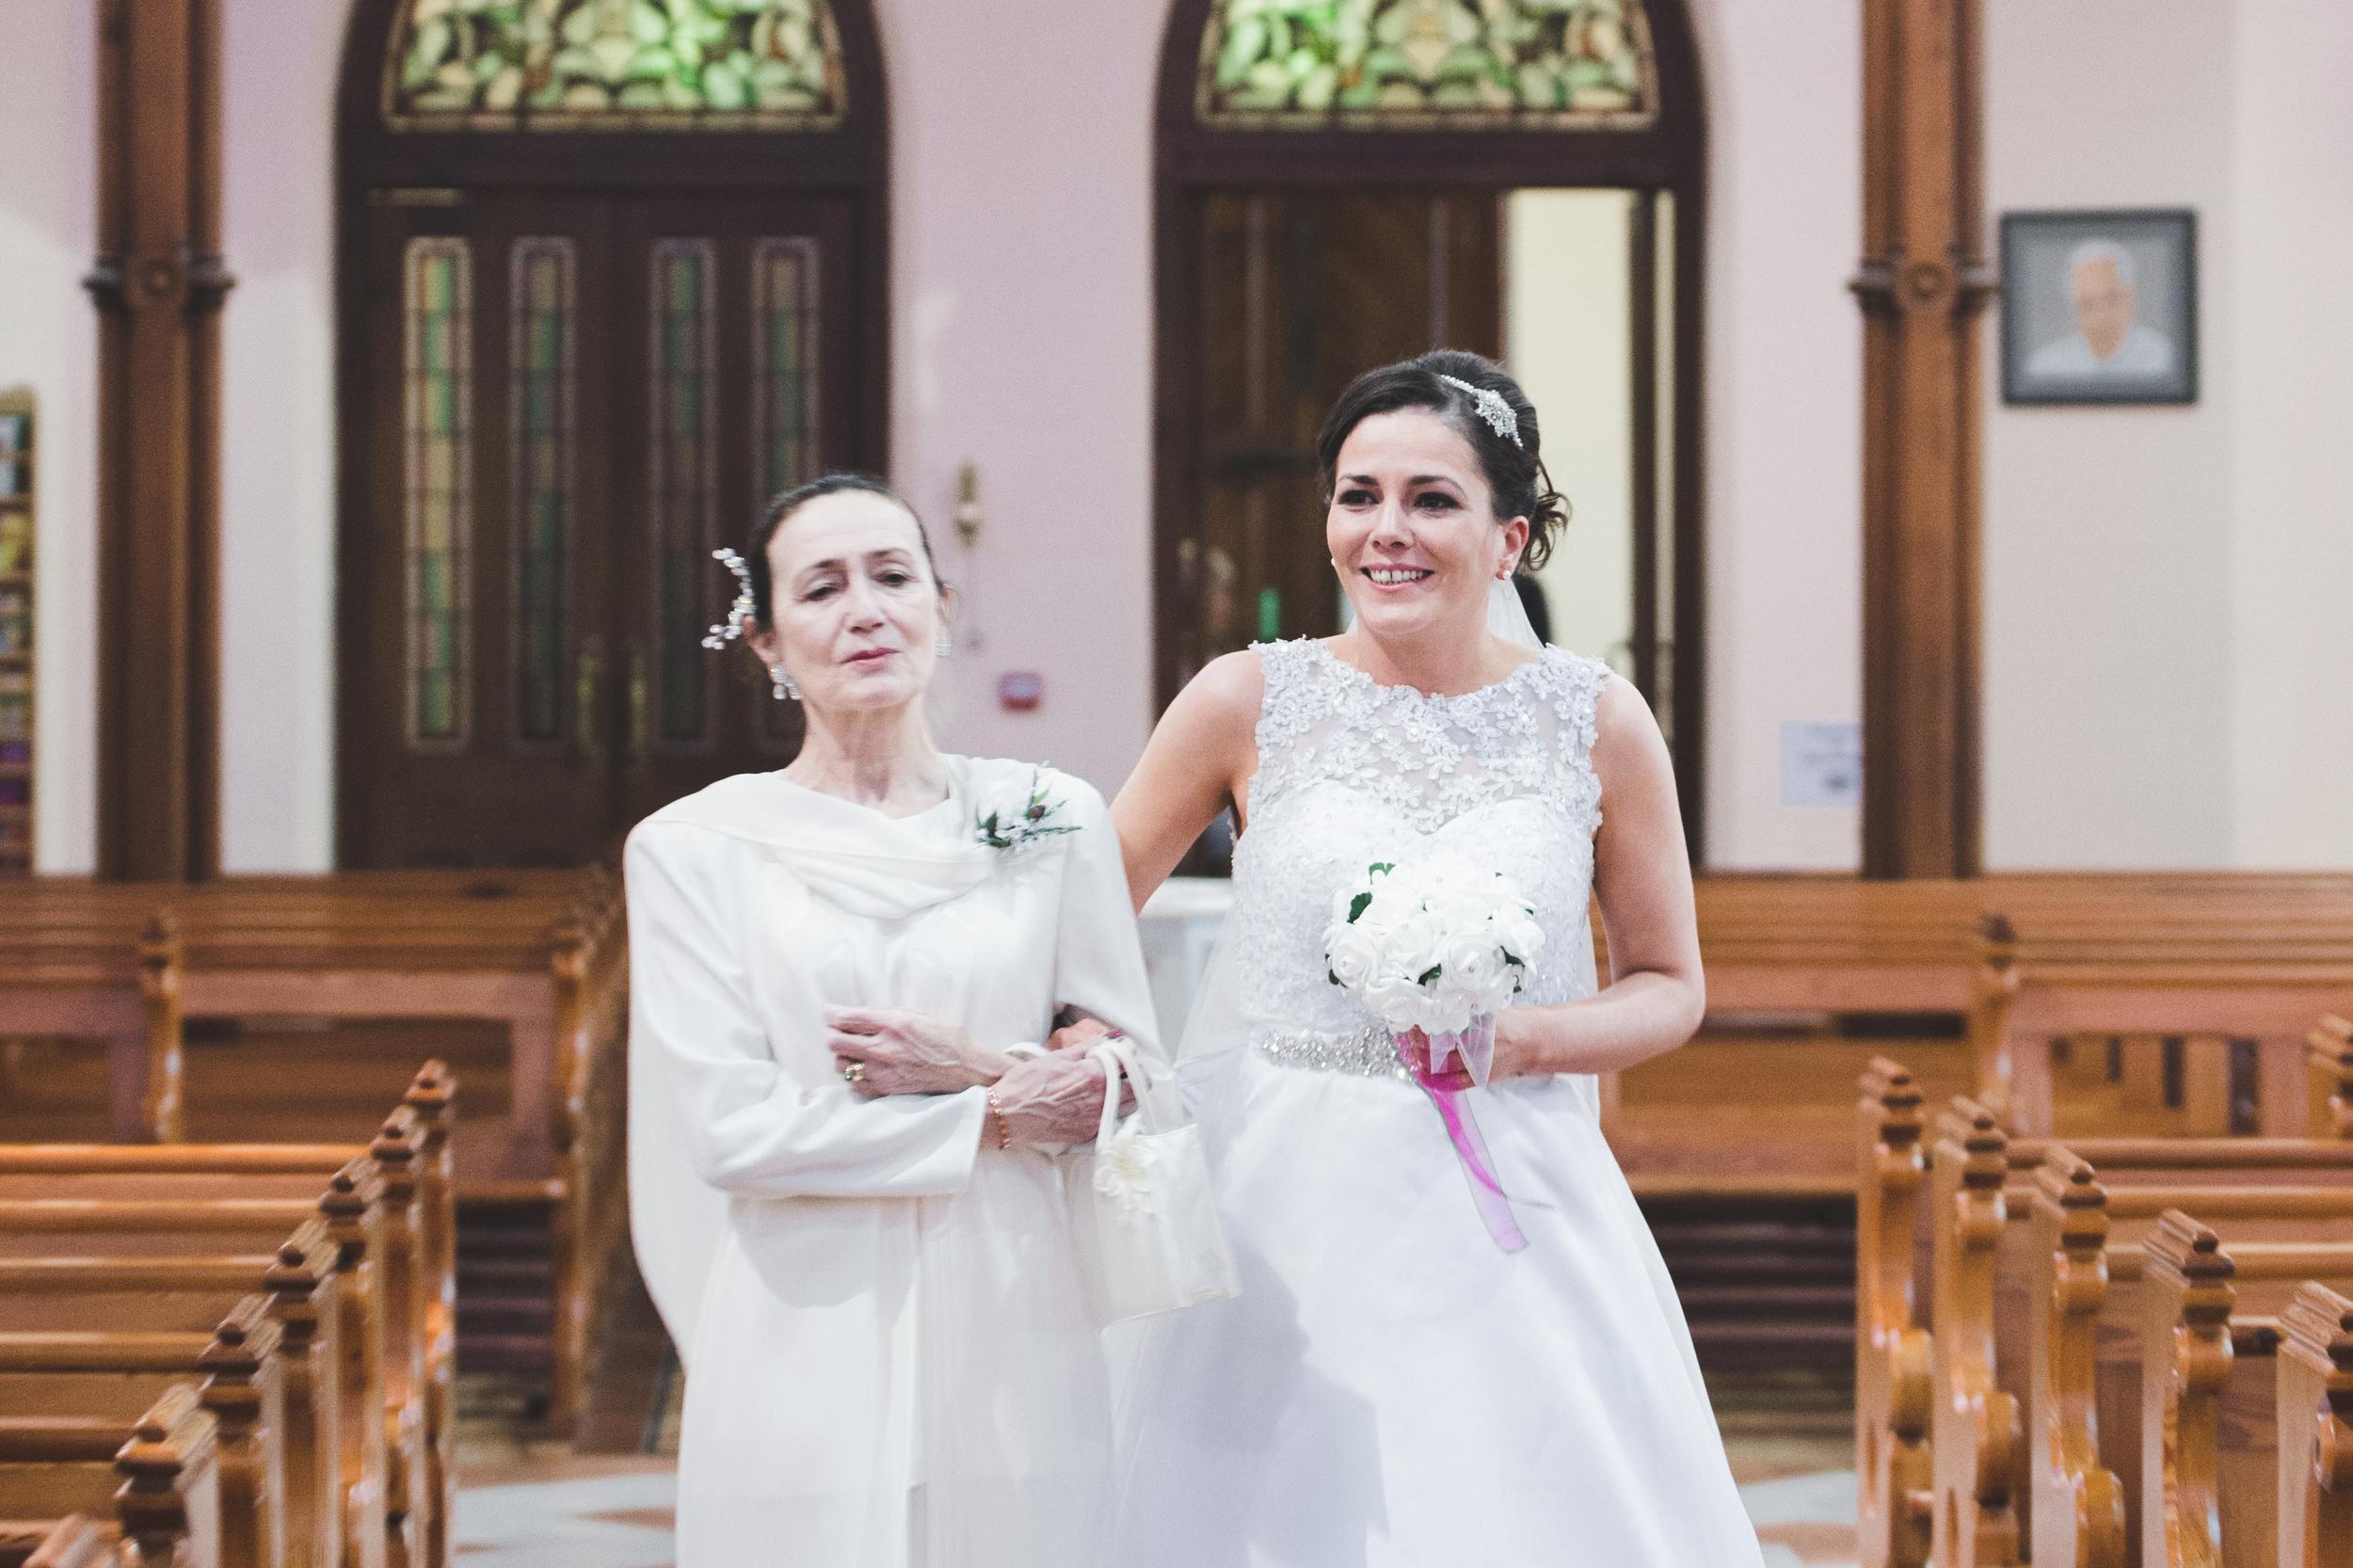 Northern_Ireland_Wedding_Photography_St_Patricks_Lisburn_Bride_Ceremony_Mother_of_the_Bride.jpg